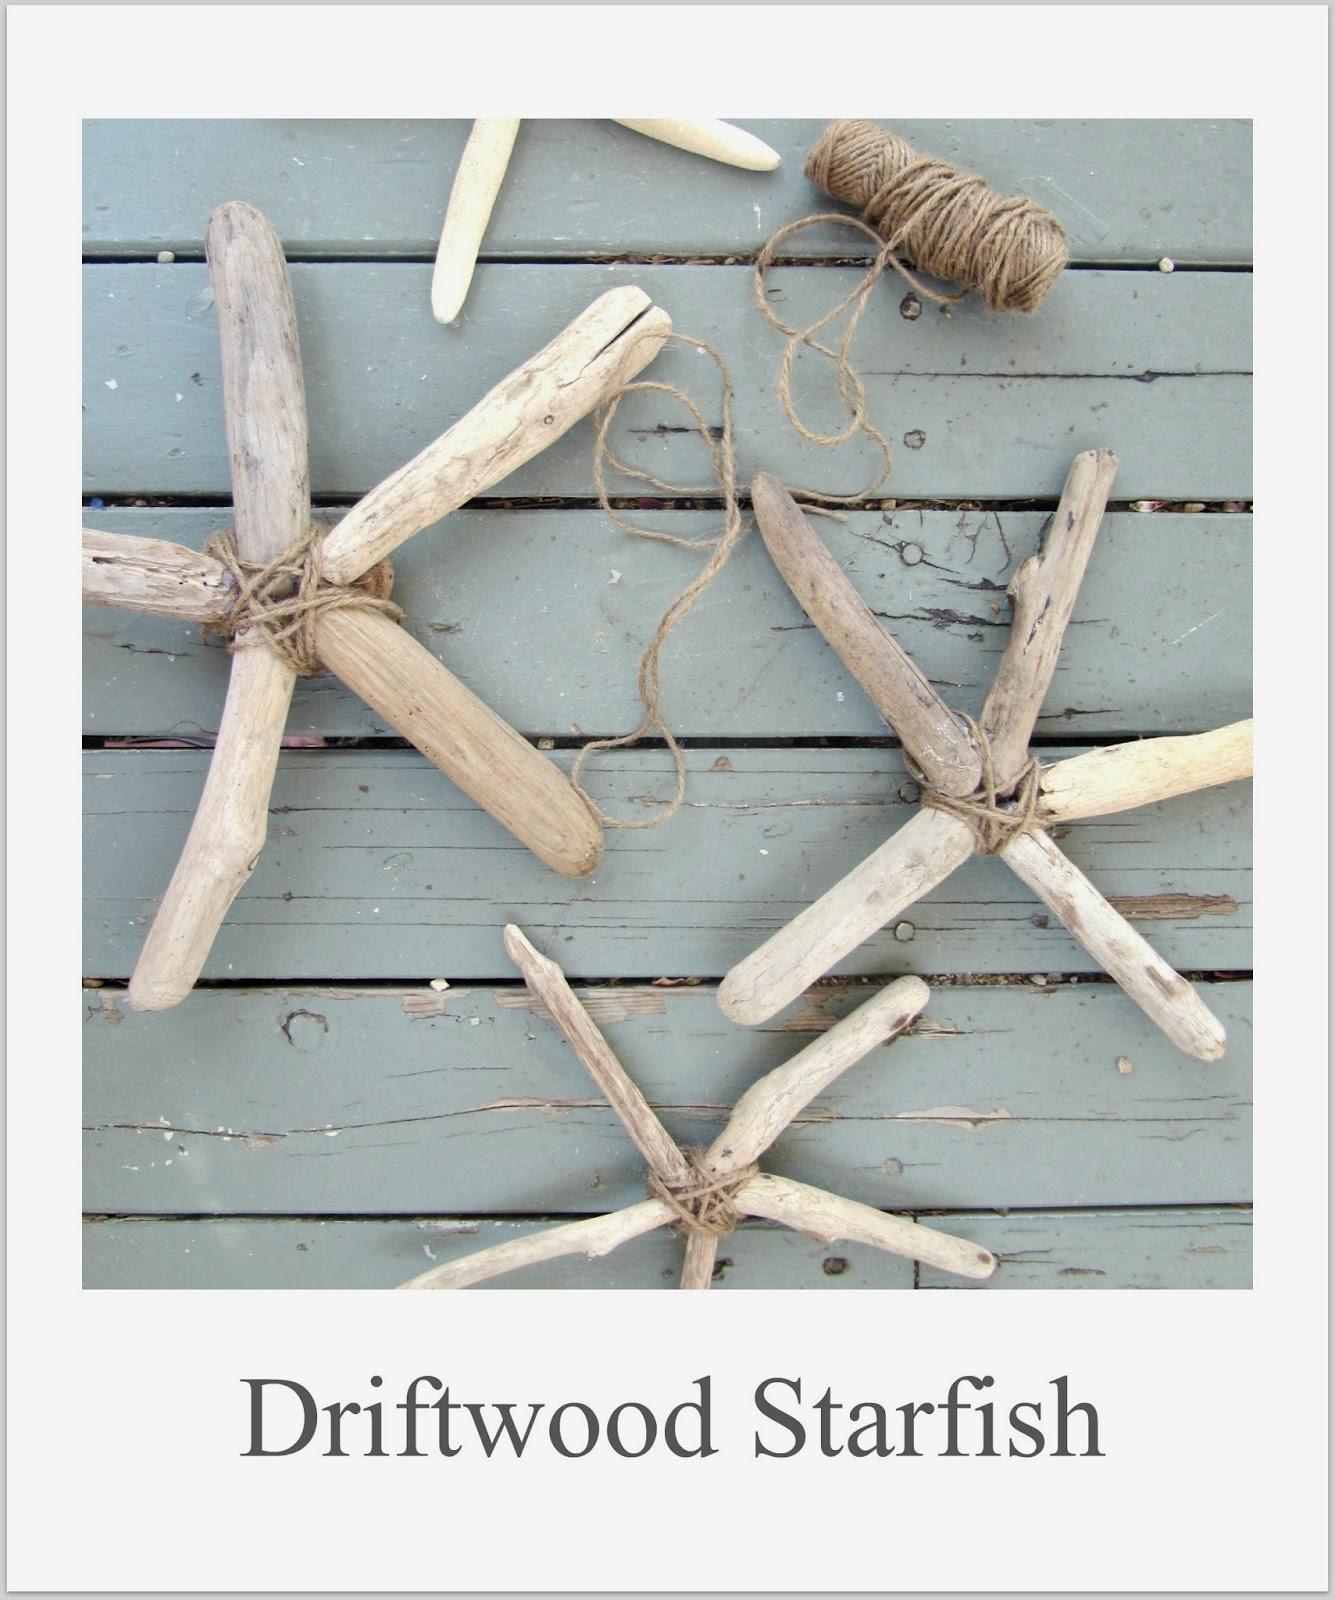 http://www.thewickerhouse.blogspot.com/2013/06/driftwood-starfish.html